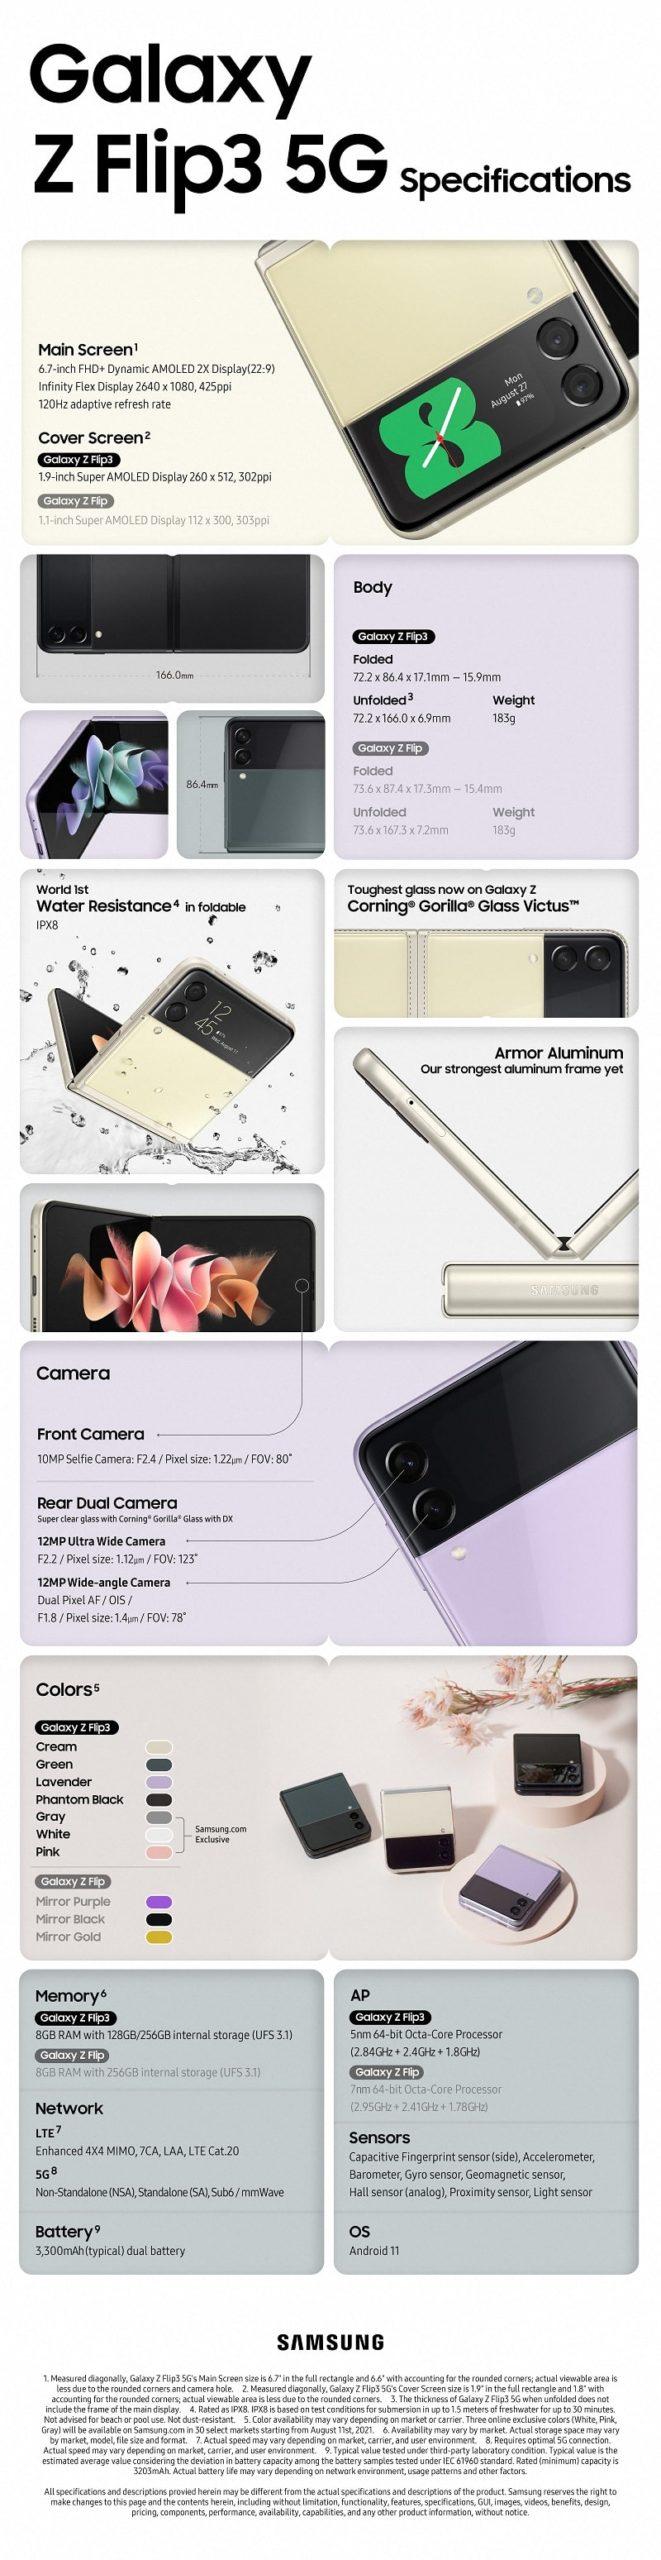 Samsung Galaxy Z Flip3 Specs